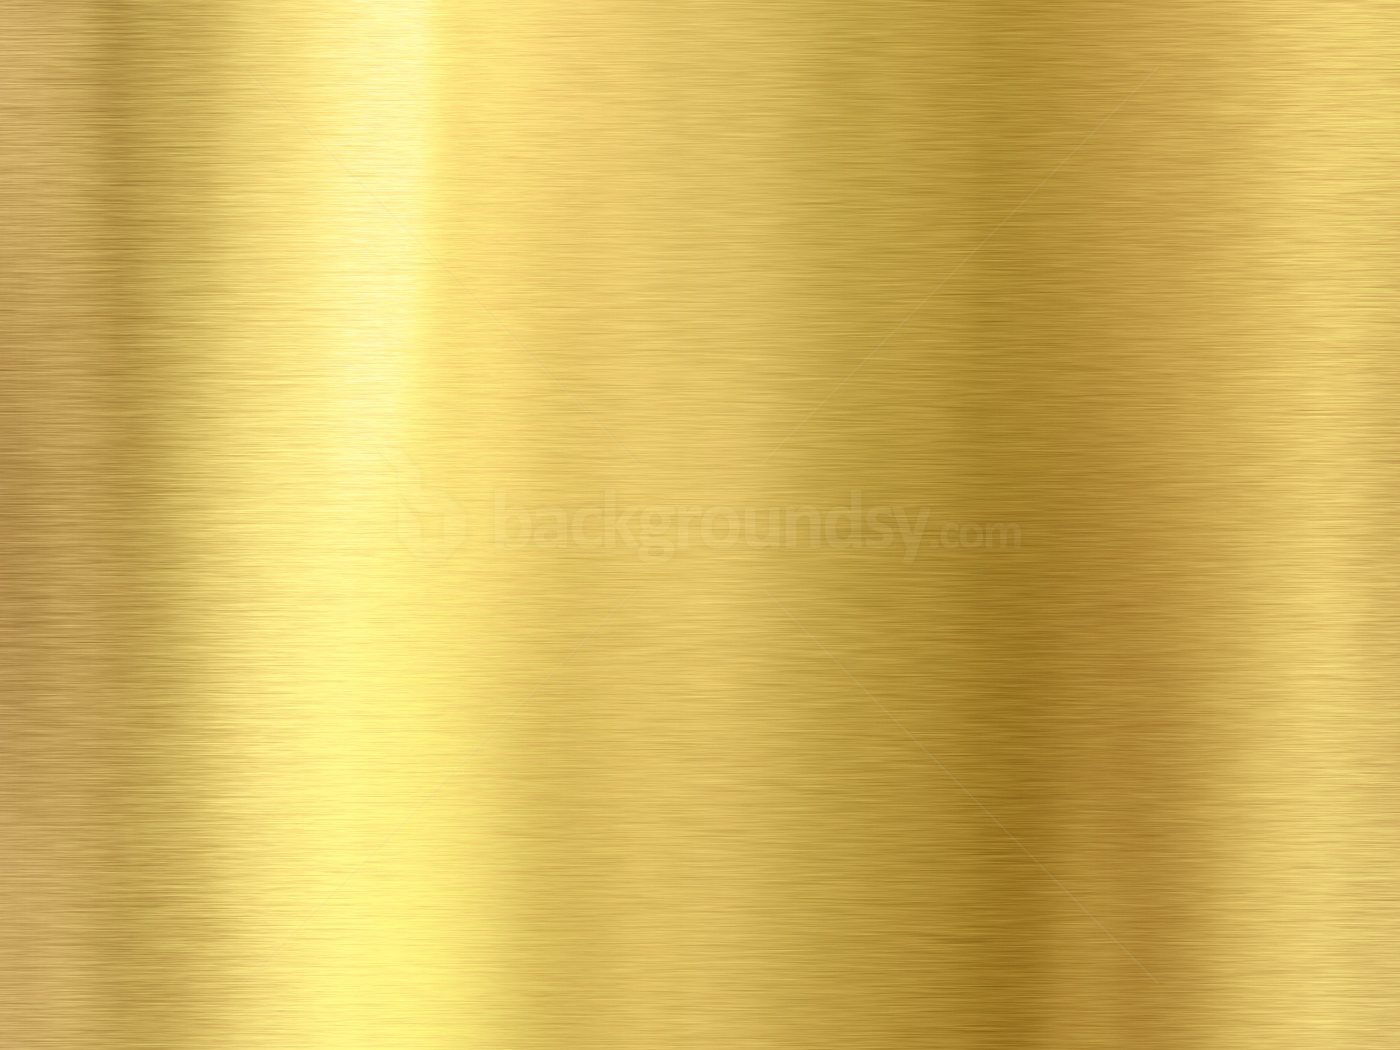 Gold background | Backgroundsy.com